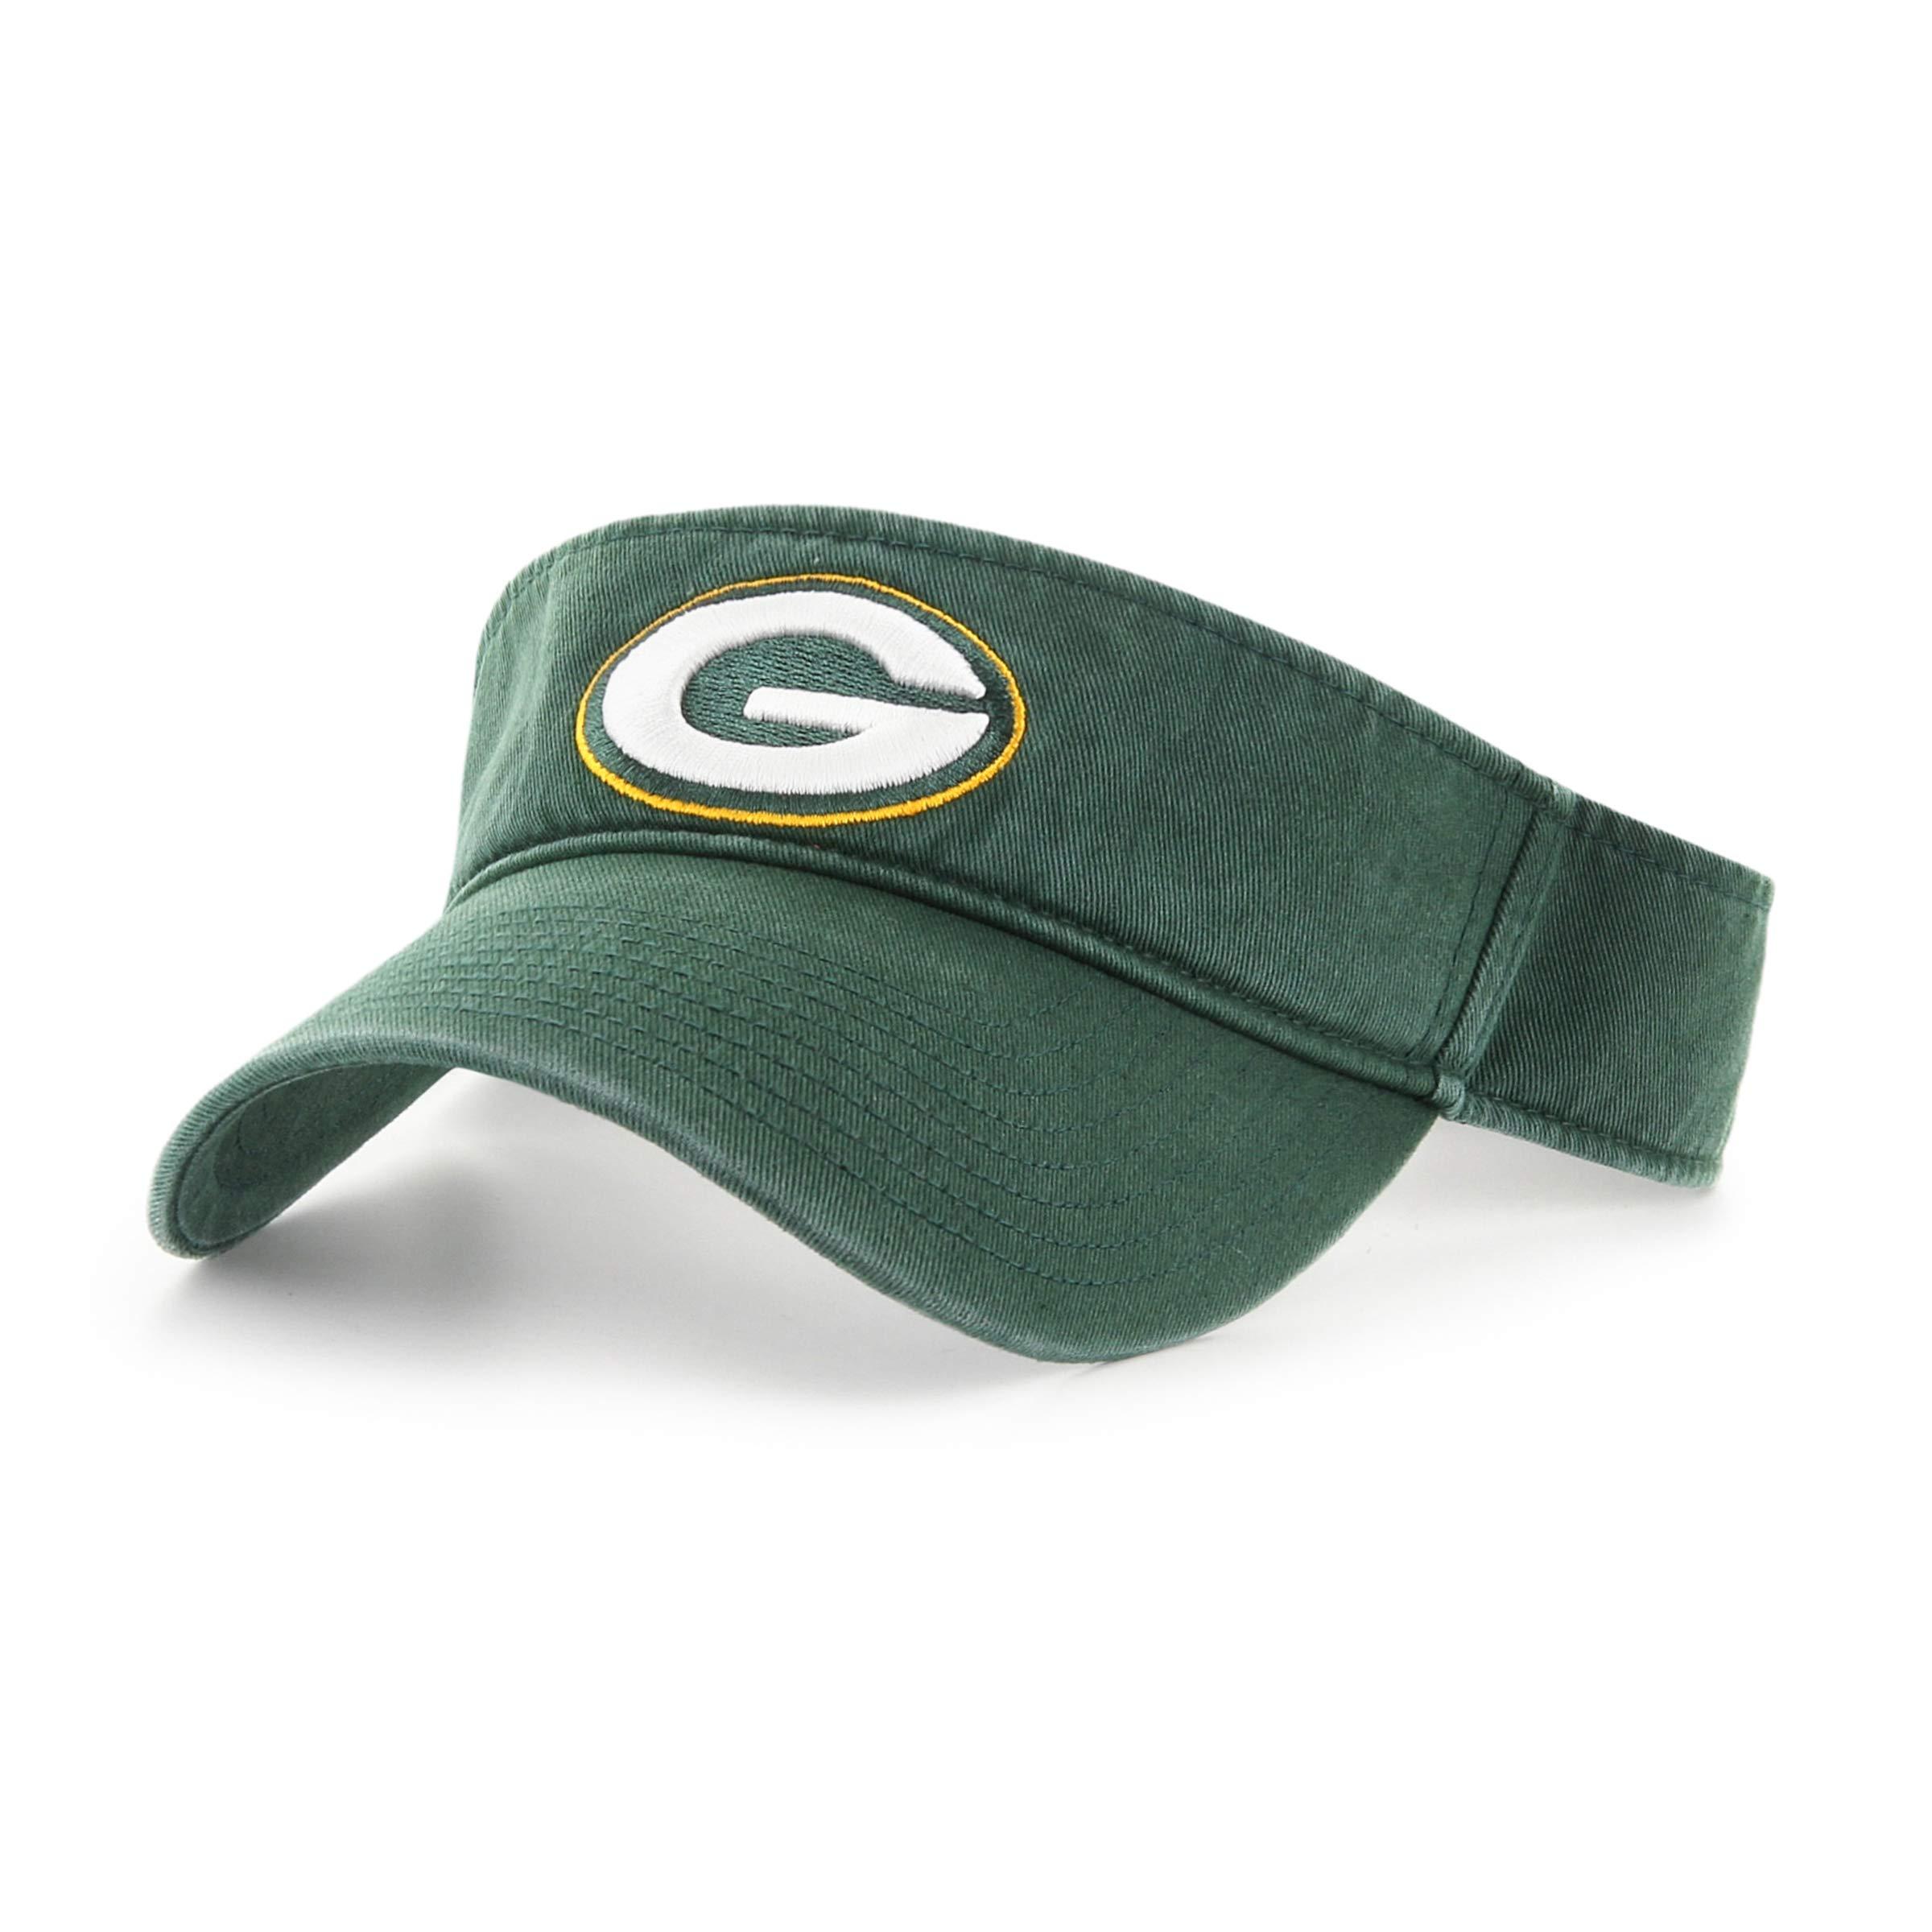 OTS NFL Green Bay Packers Male Visor, Dark Green, One Size